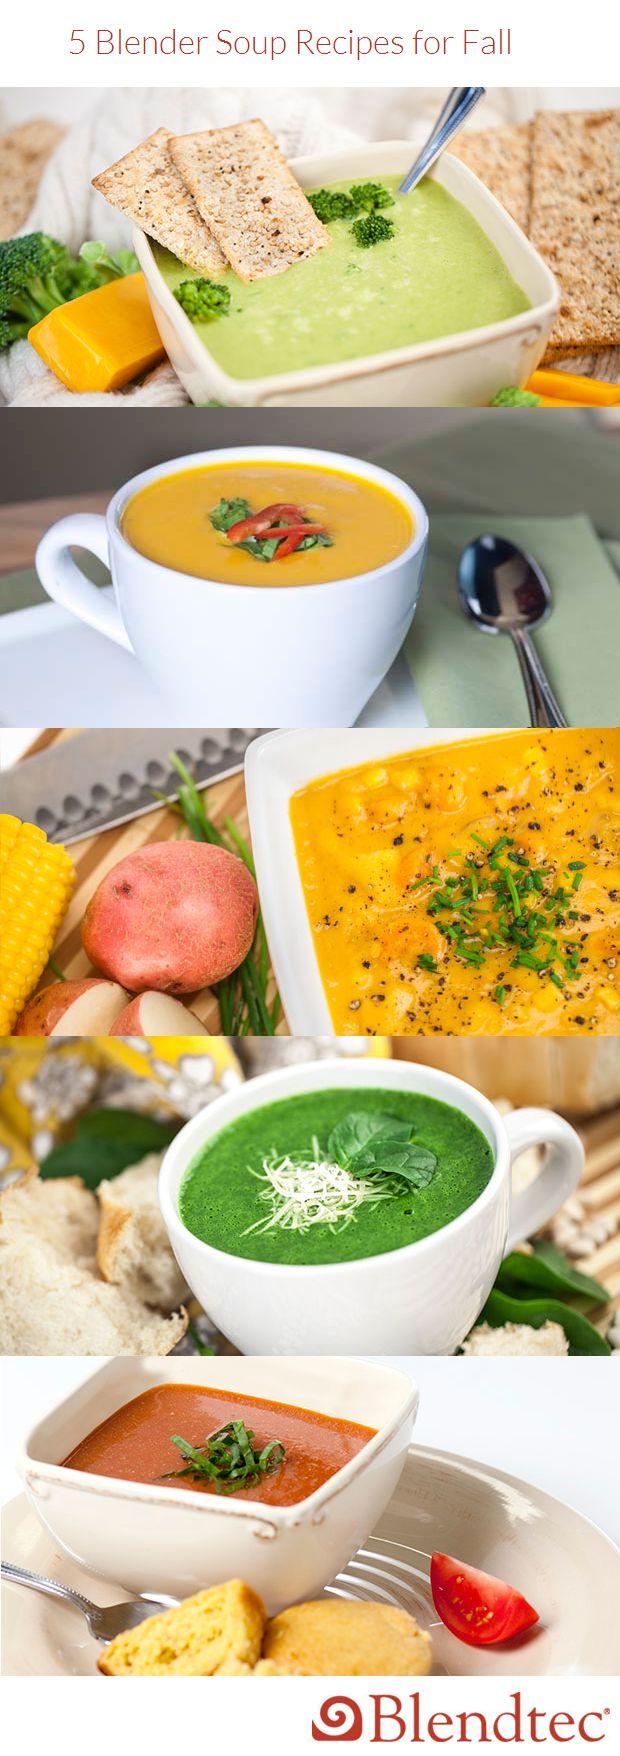 5 Blender Soup Recipes for Fall